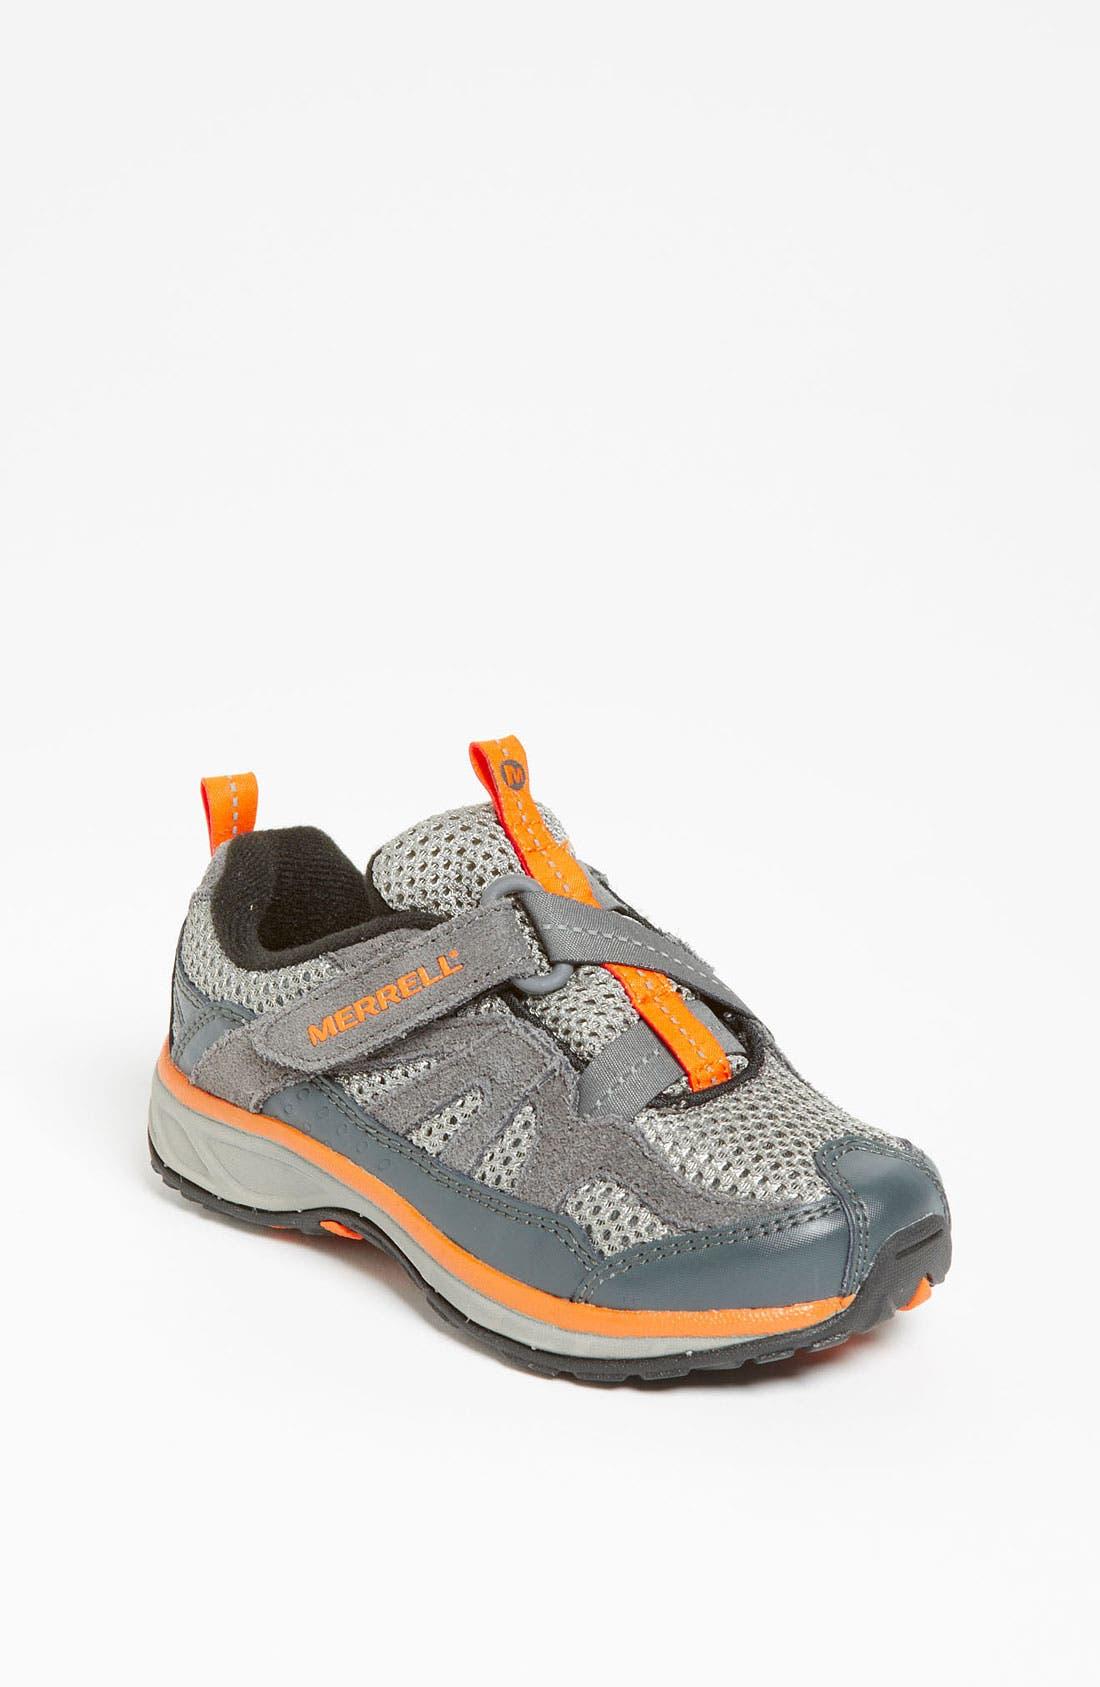 Alternate Image 1 Selected - Merrell 'Zoomerang' Sneaker (Toddler, Little Kid & Big Kid)